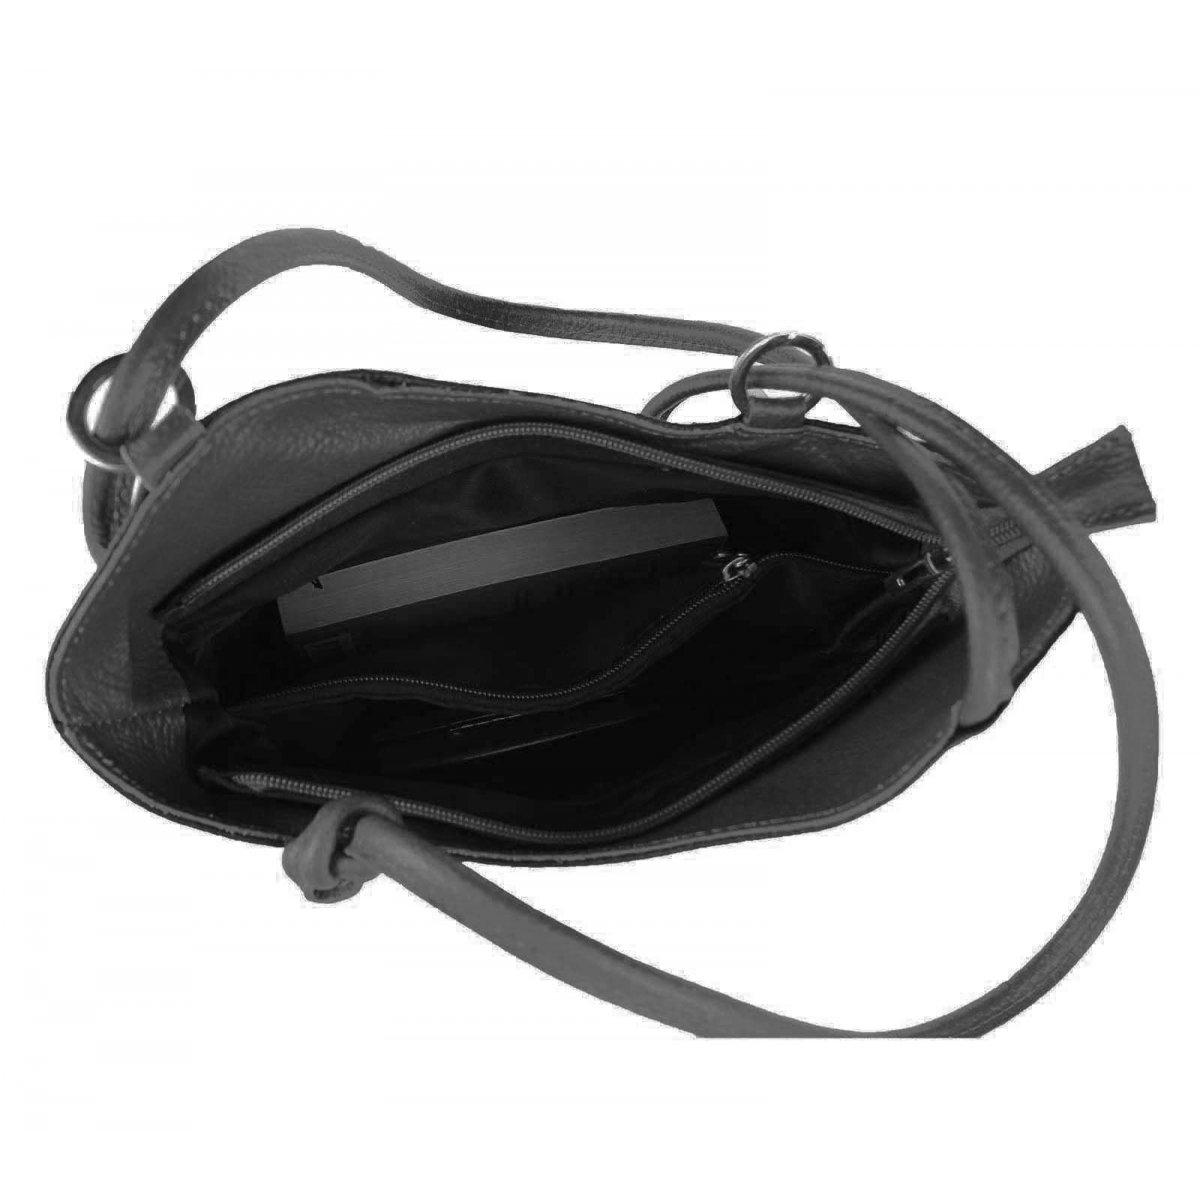 ital damen echt leder rucksack handtasche schultertasche. Black Bedroom Furniture Sets. Home Design Ideas